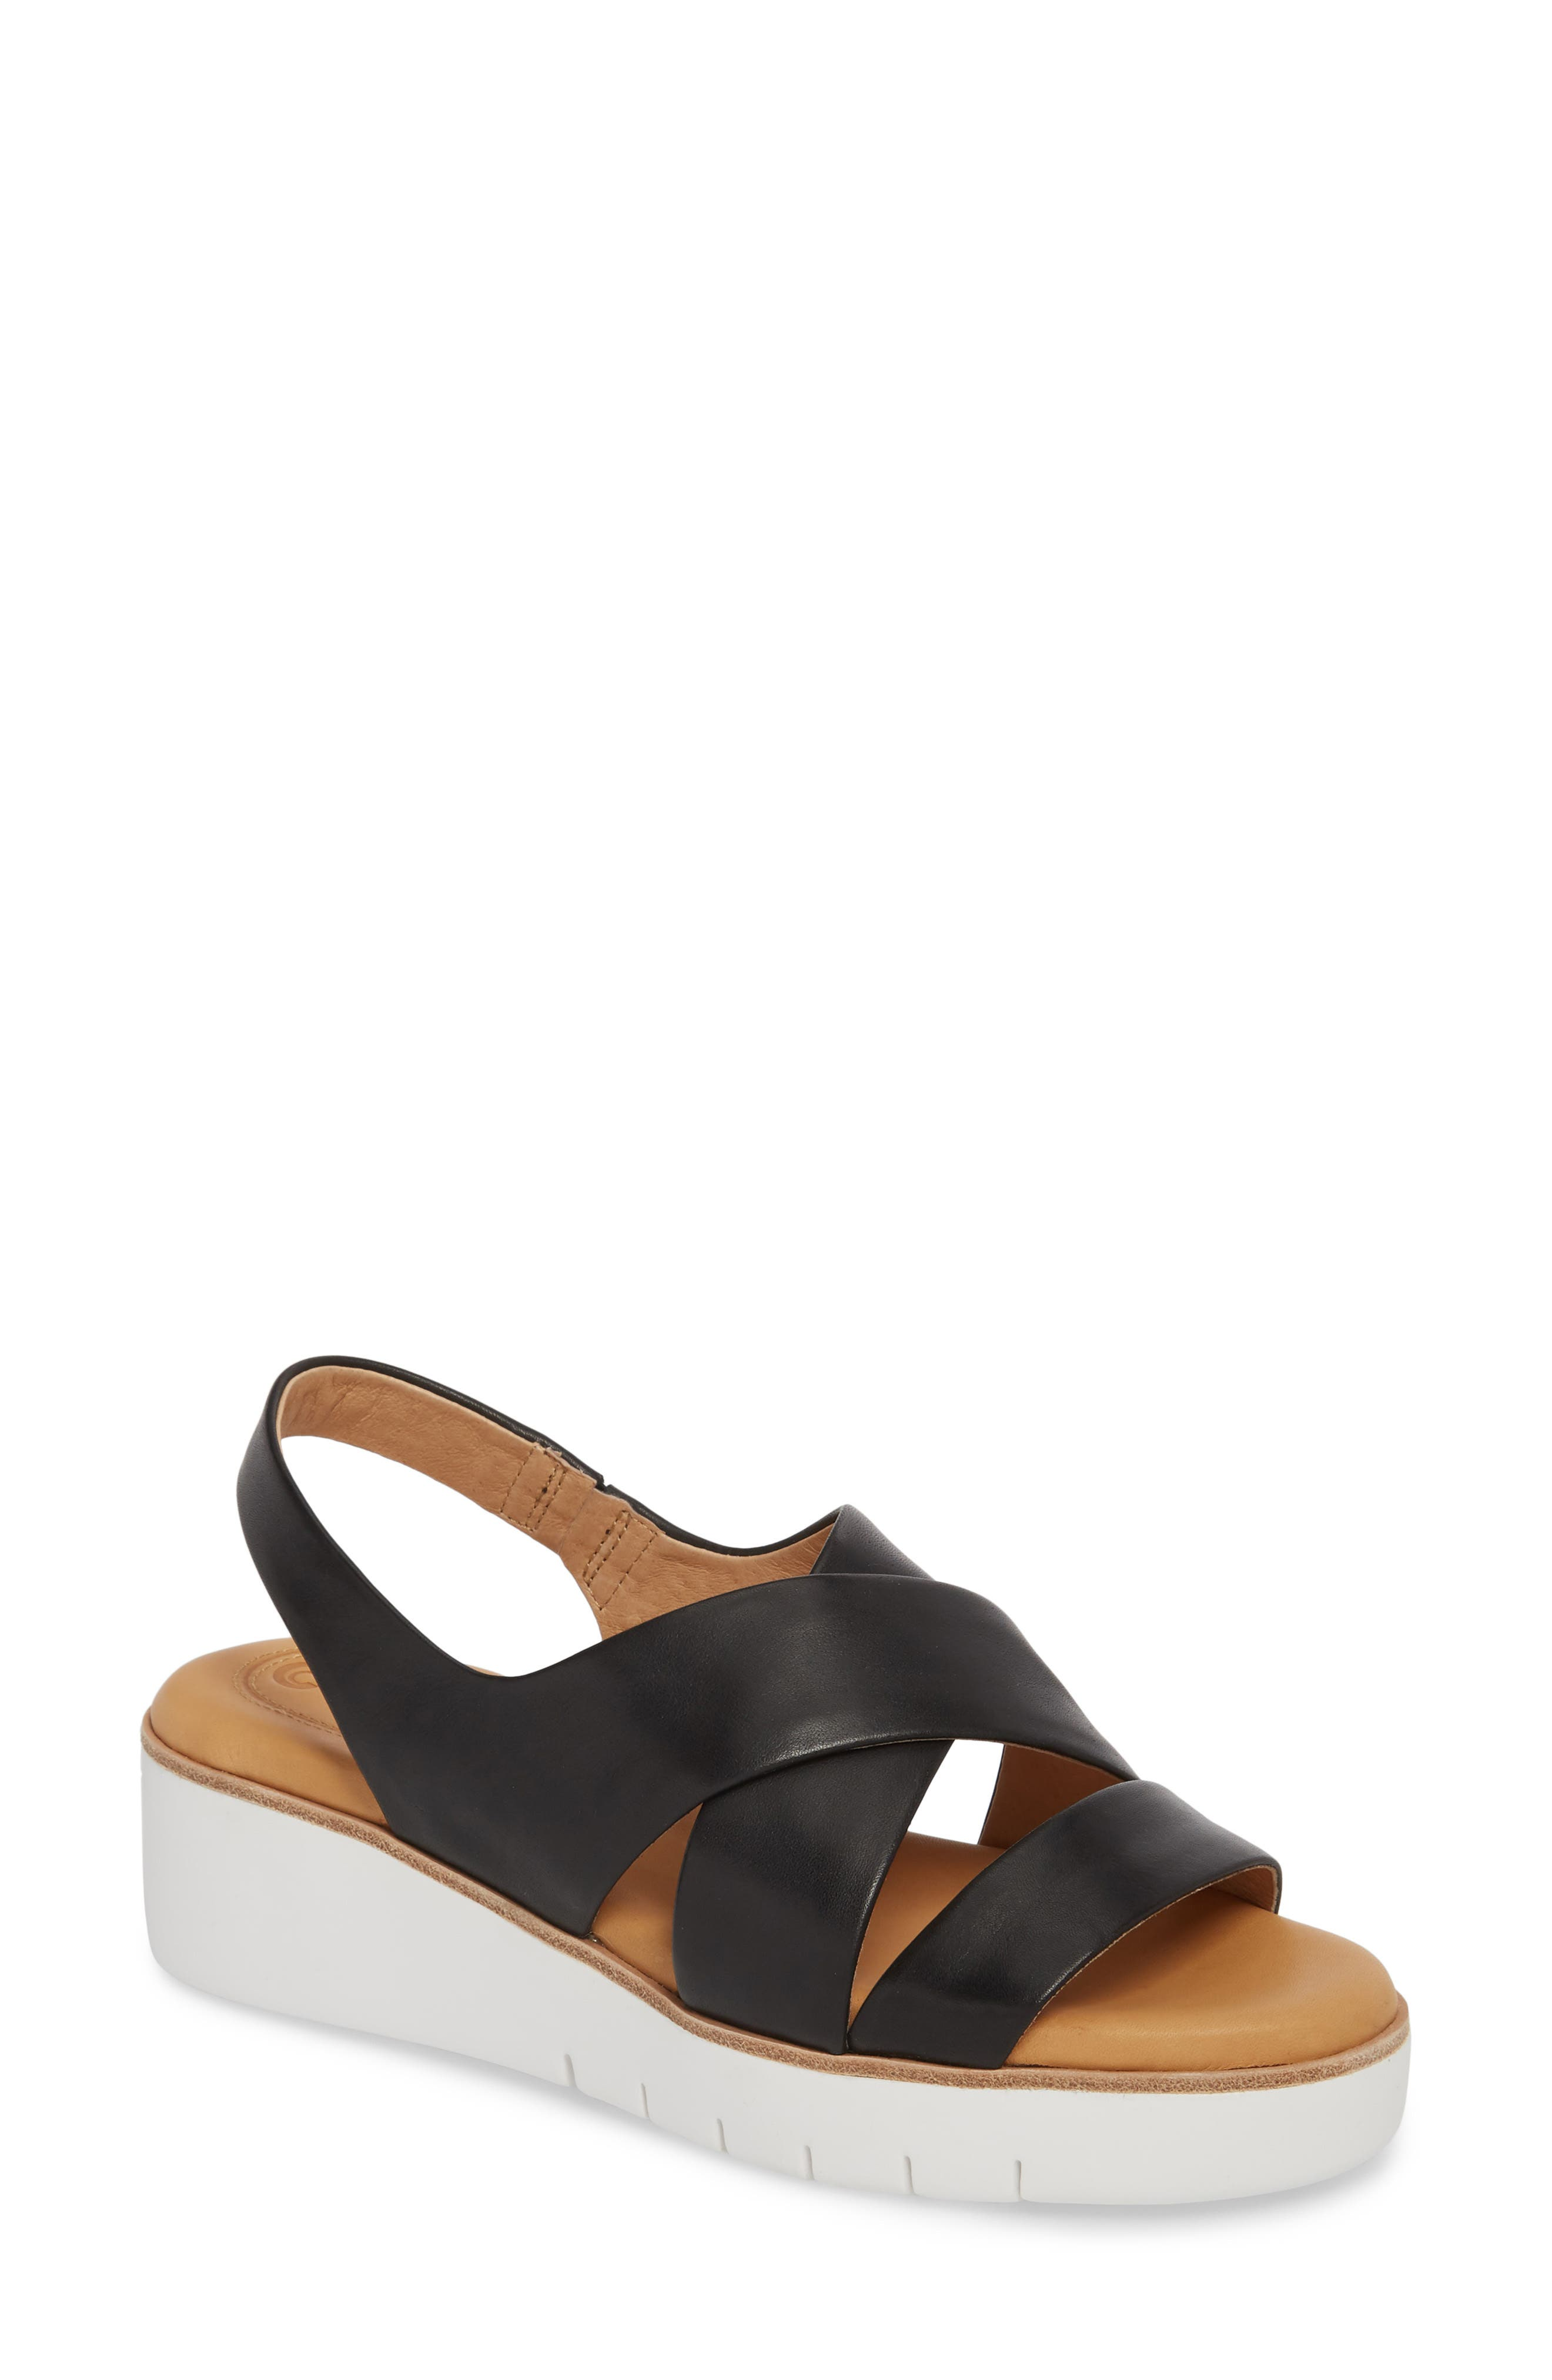 Brinney Wedge Sandal,                         Main,                         color, BLACK LEATHER